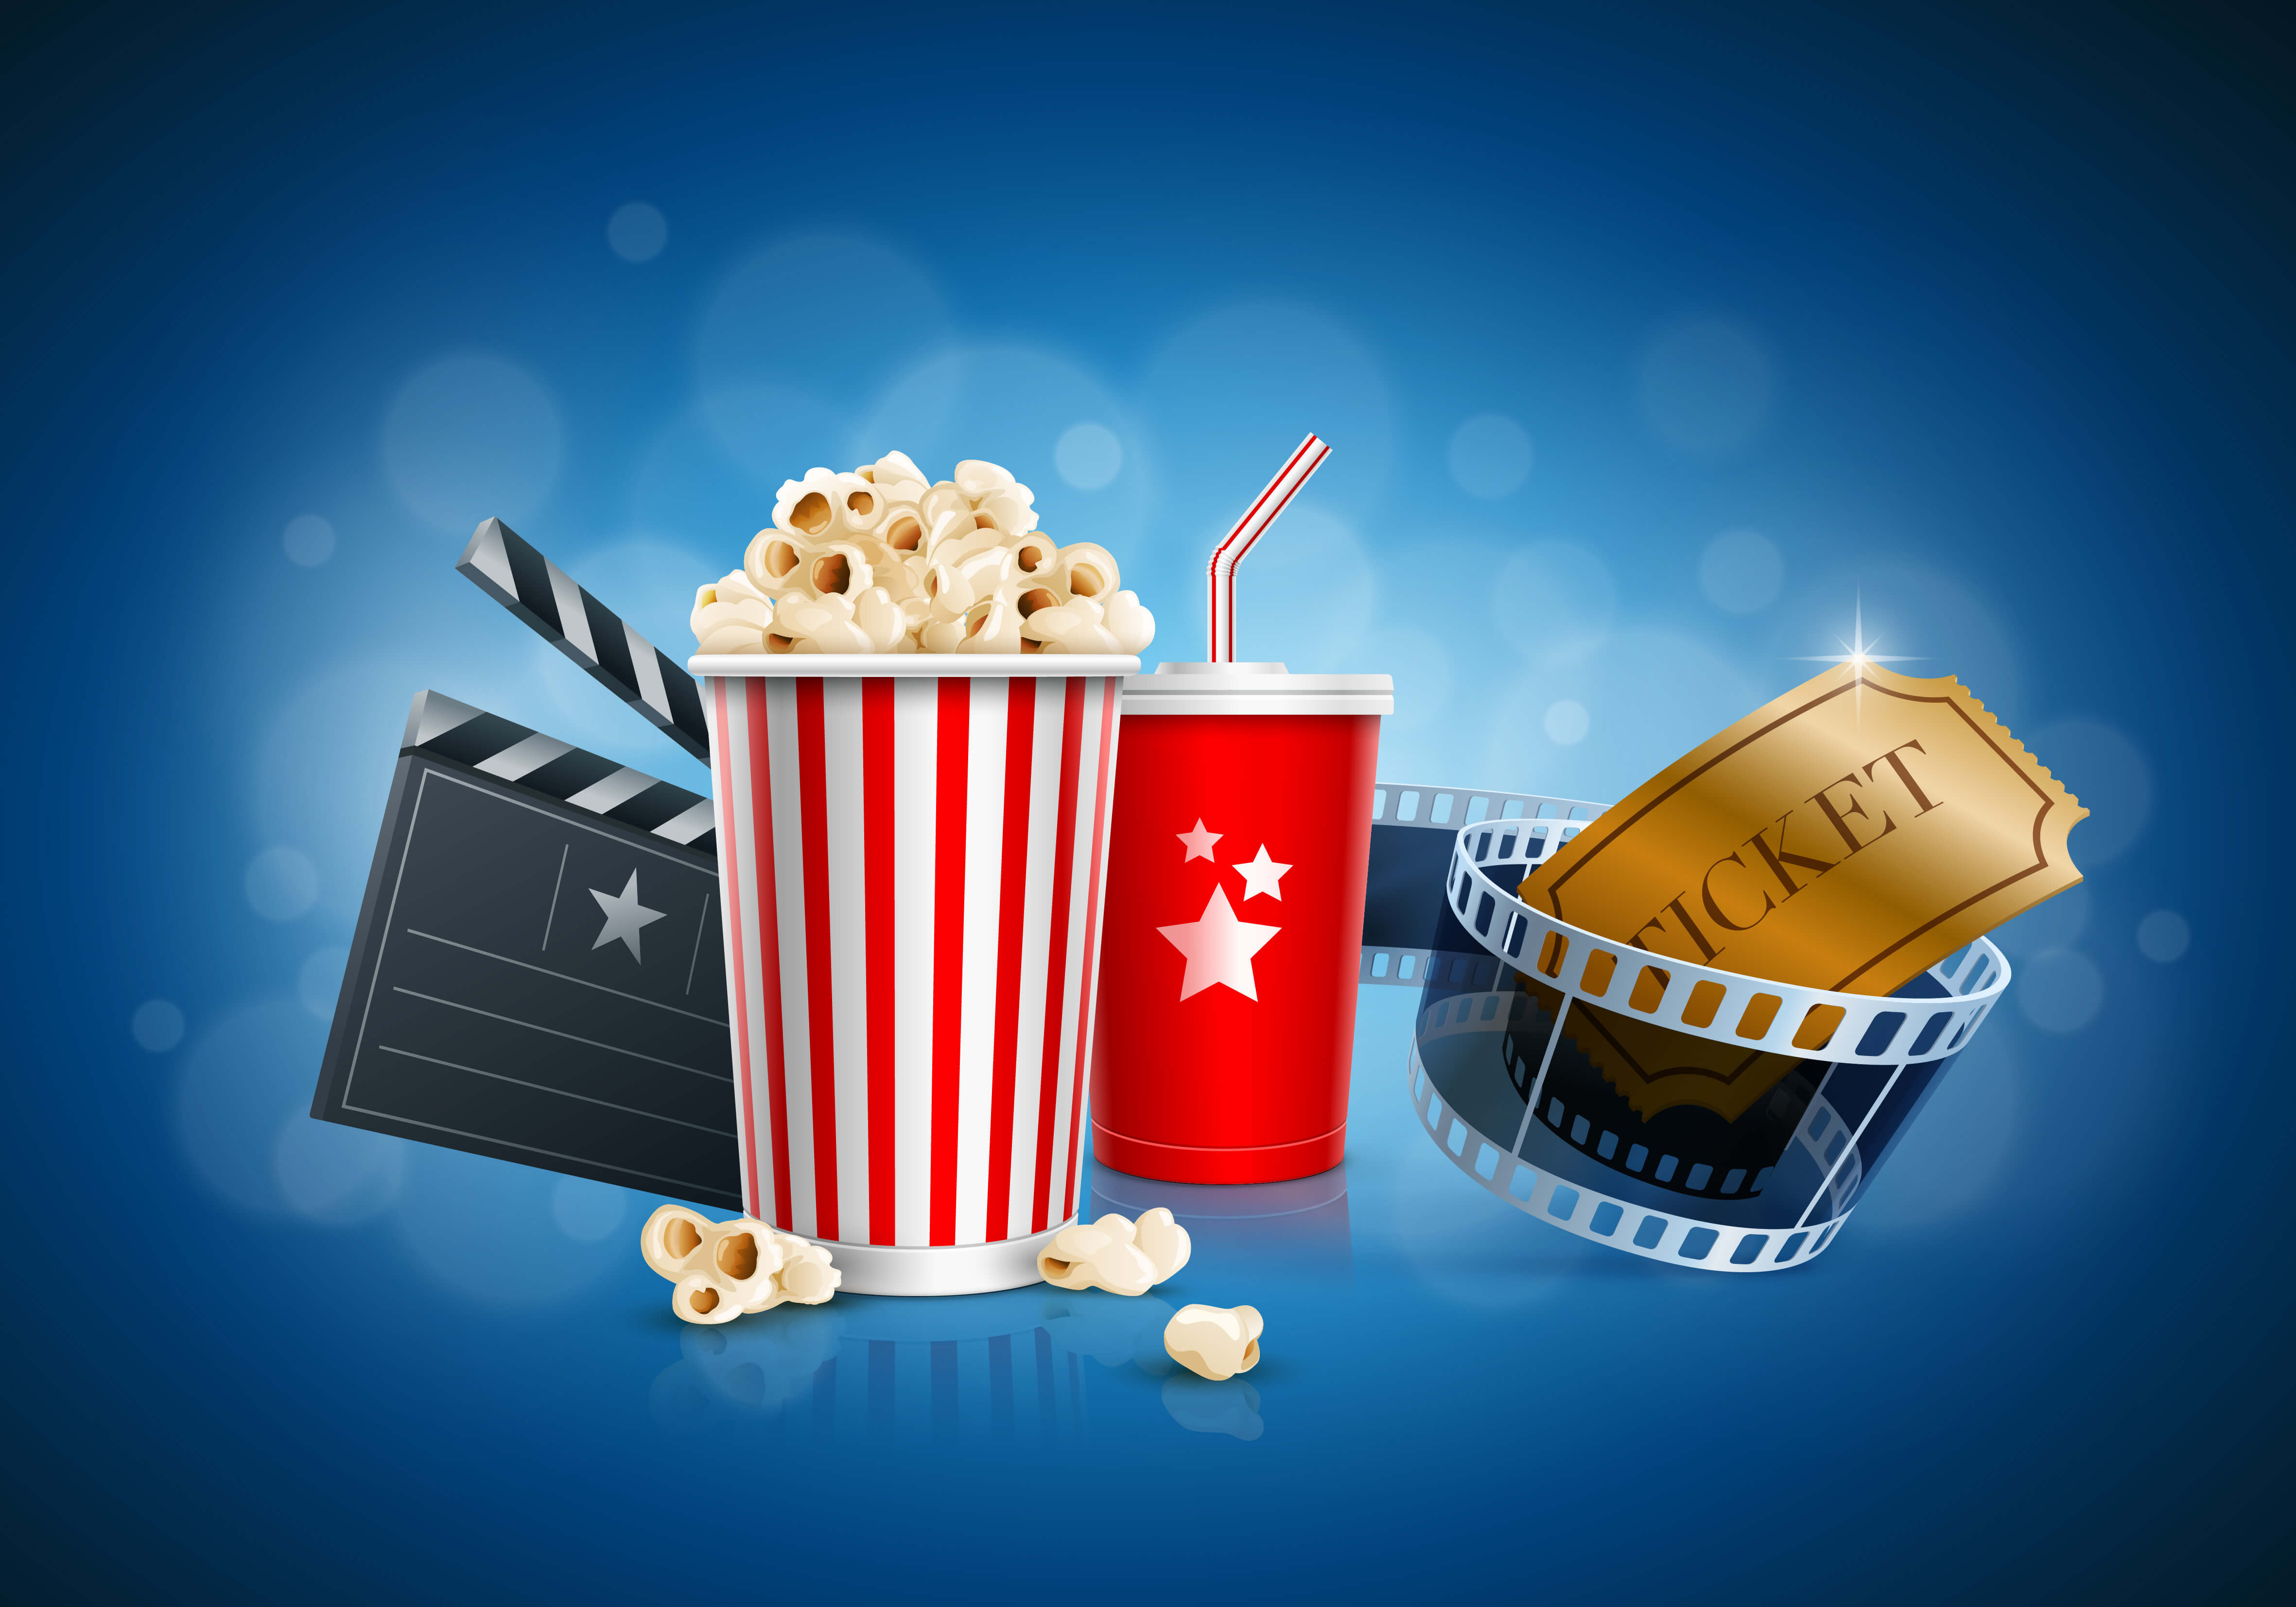 cinema props 2